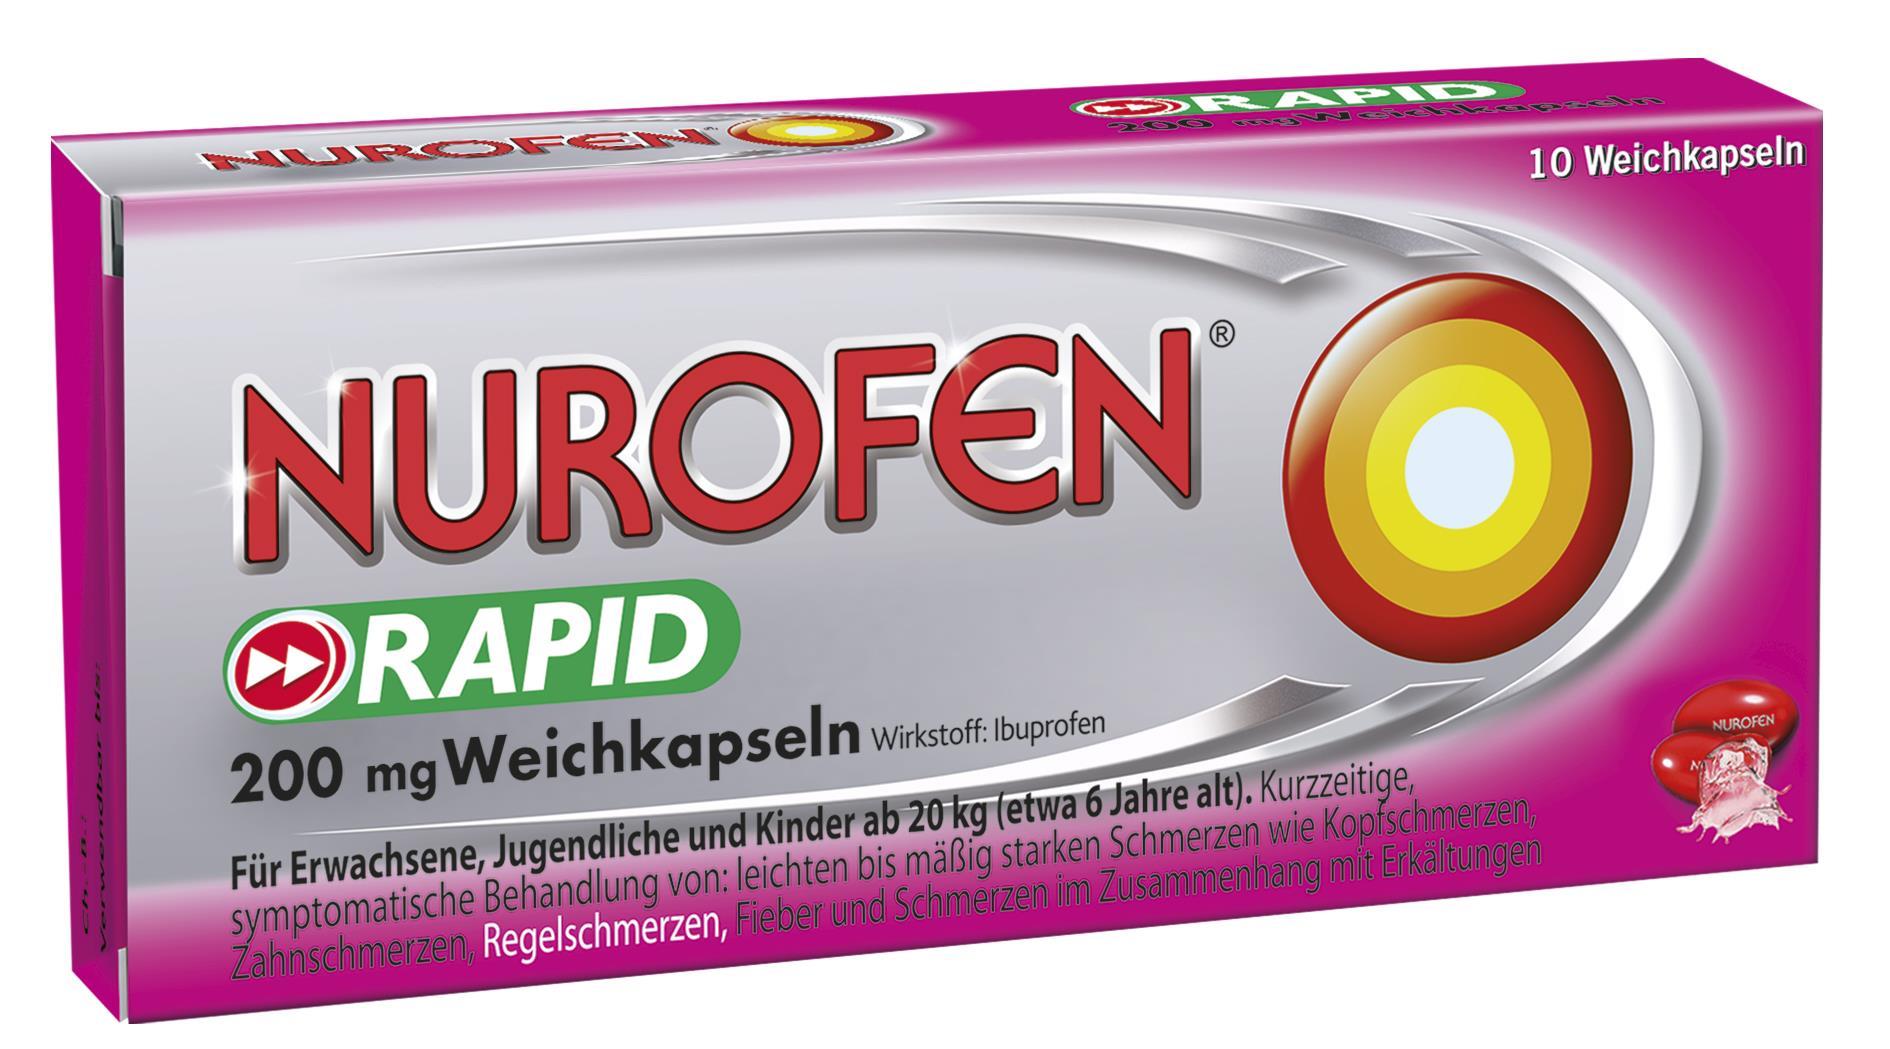 Nurofen rapid 200 mg - Weichkapseln